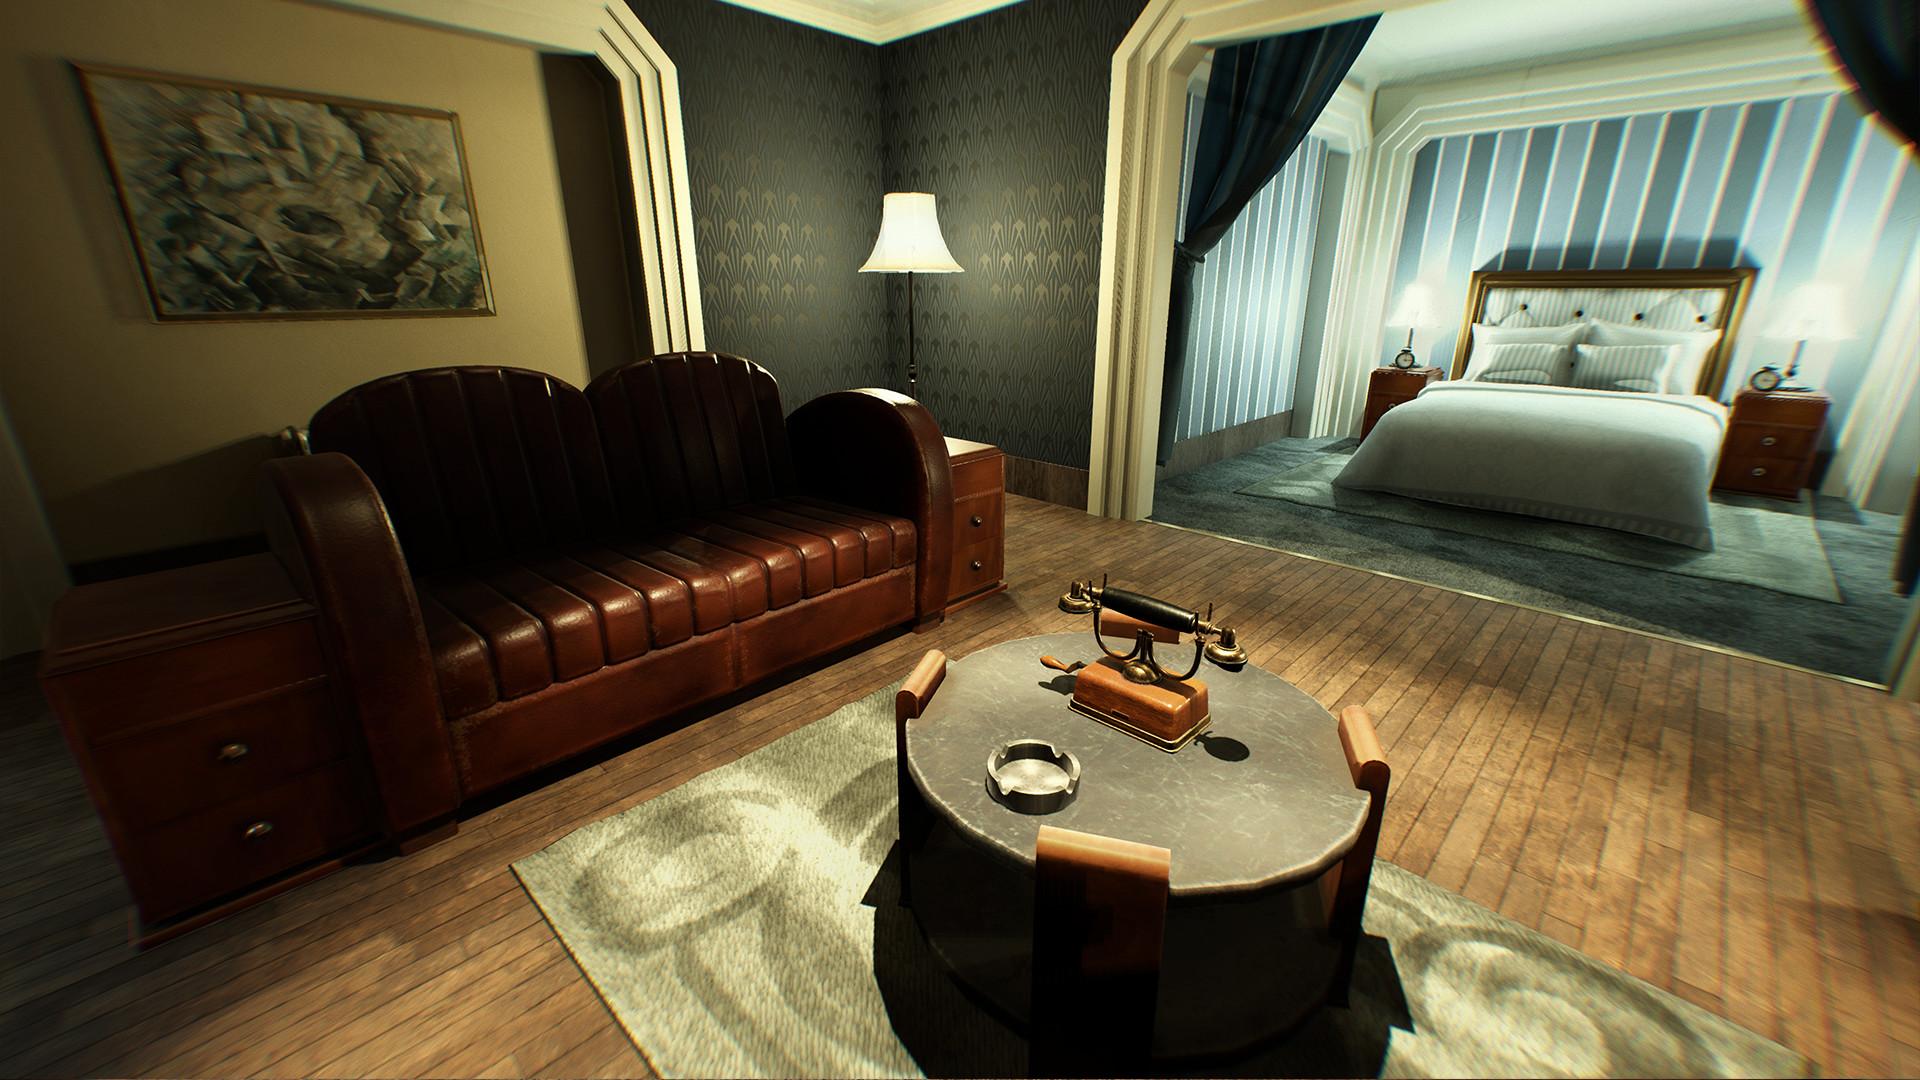 Augustin grassien bedroom 03